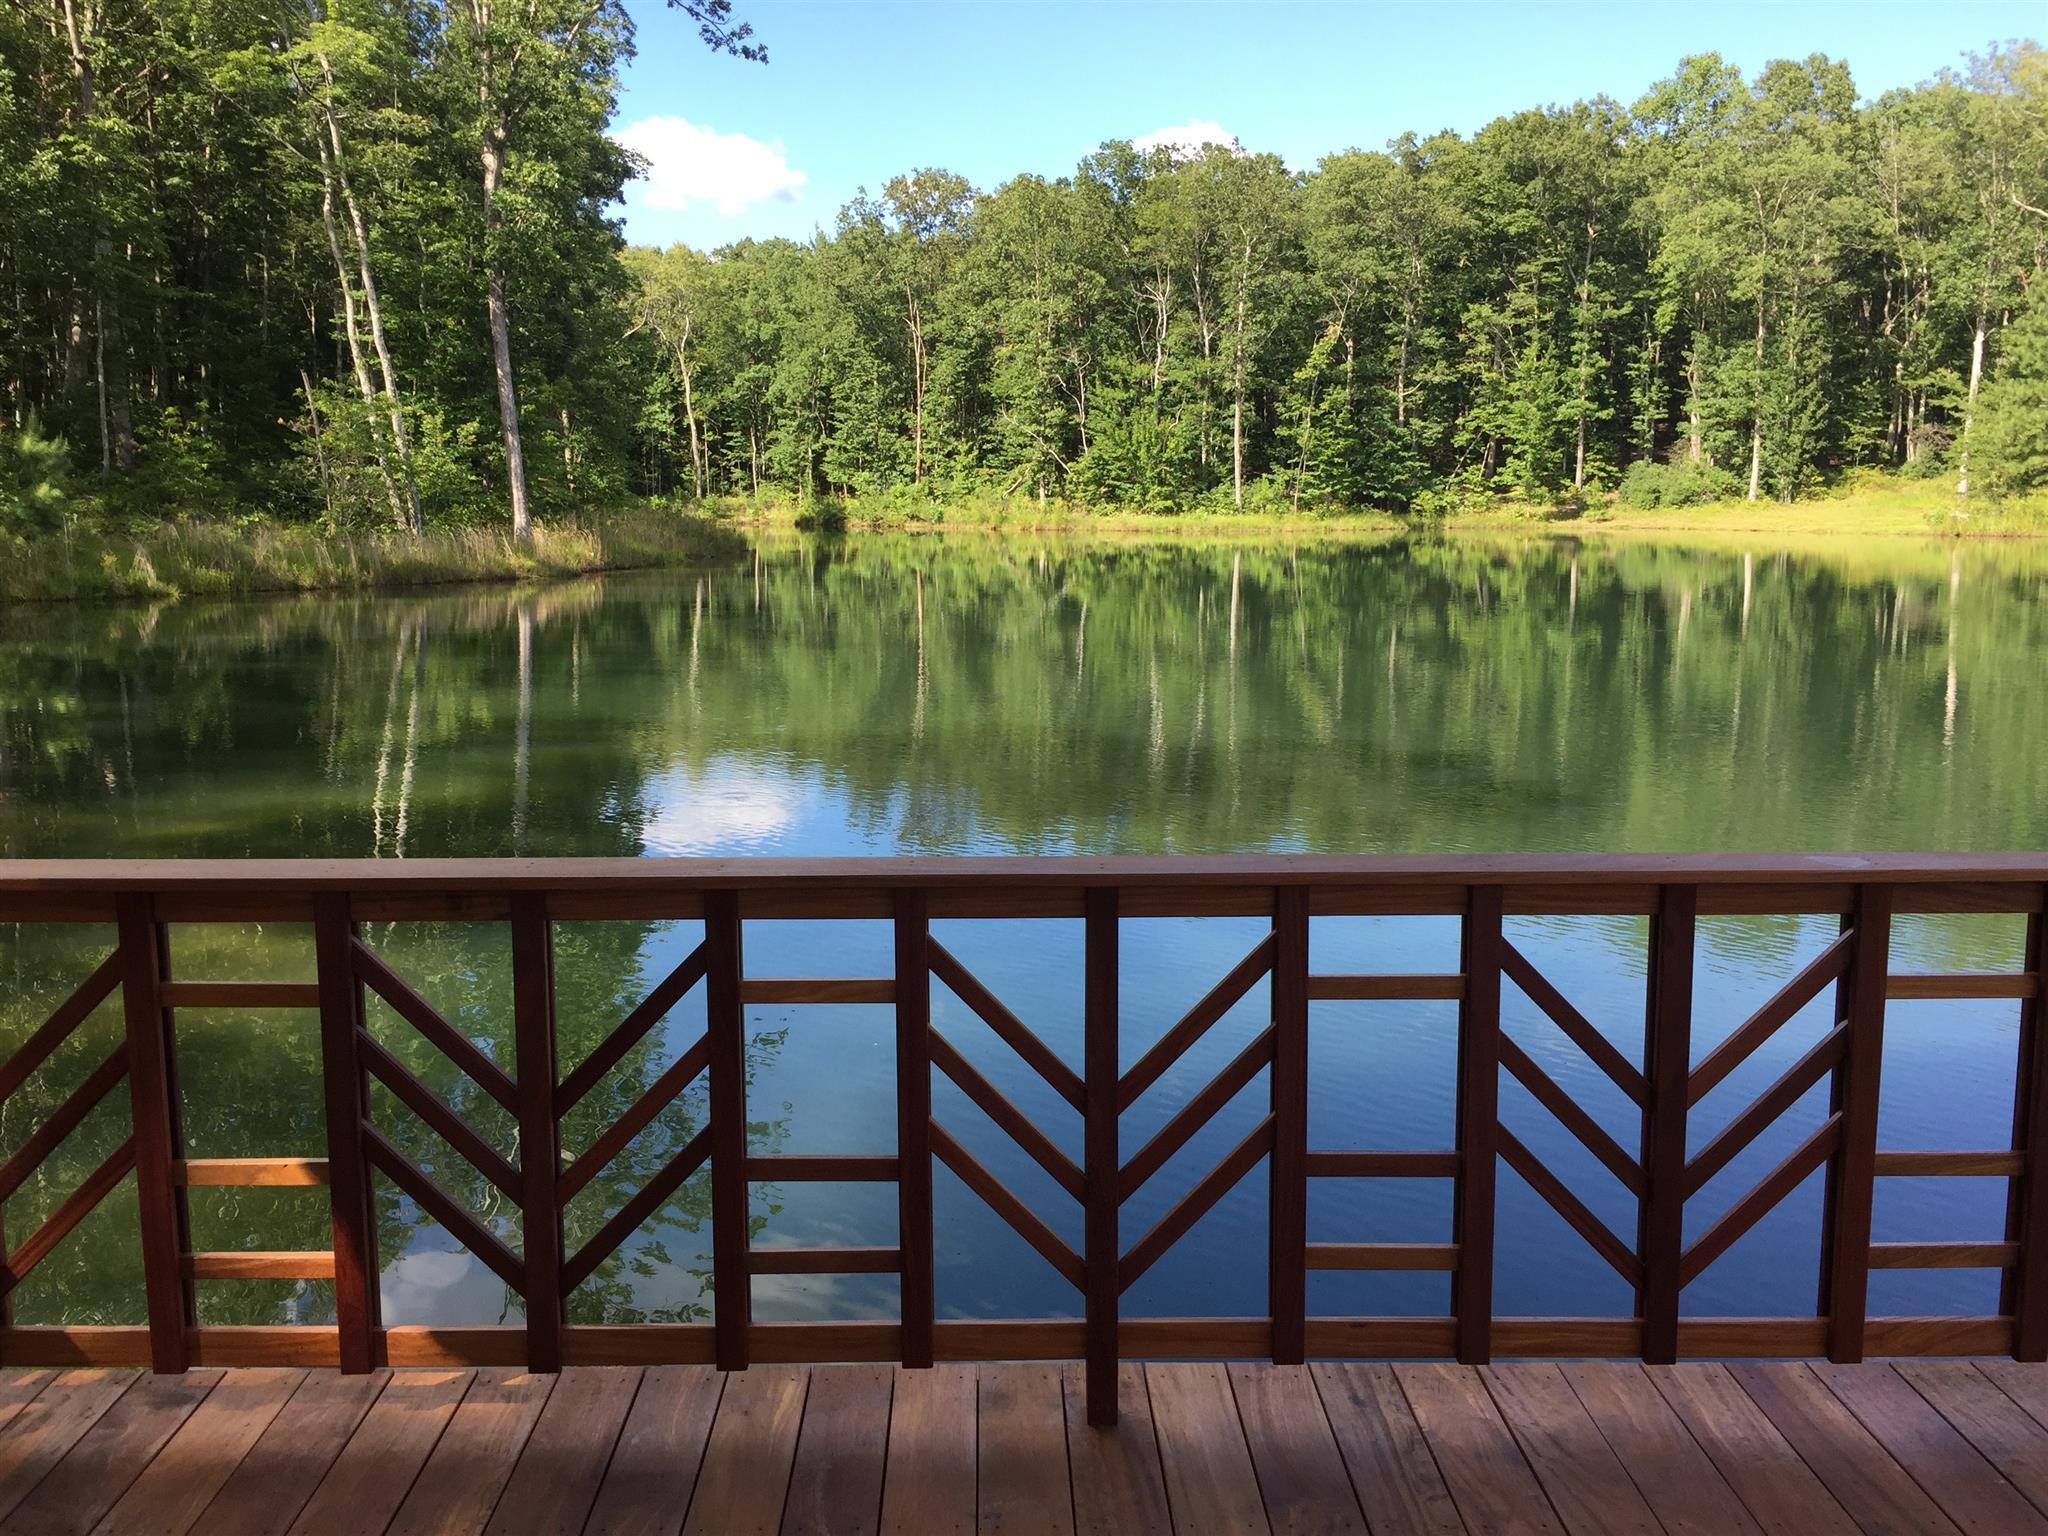 15 Myers Point Rd Lot 15, Sewanee, TN 37375 - Sewanee, TN real estate listing